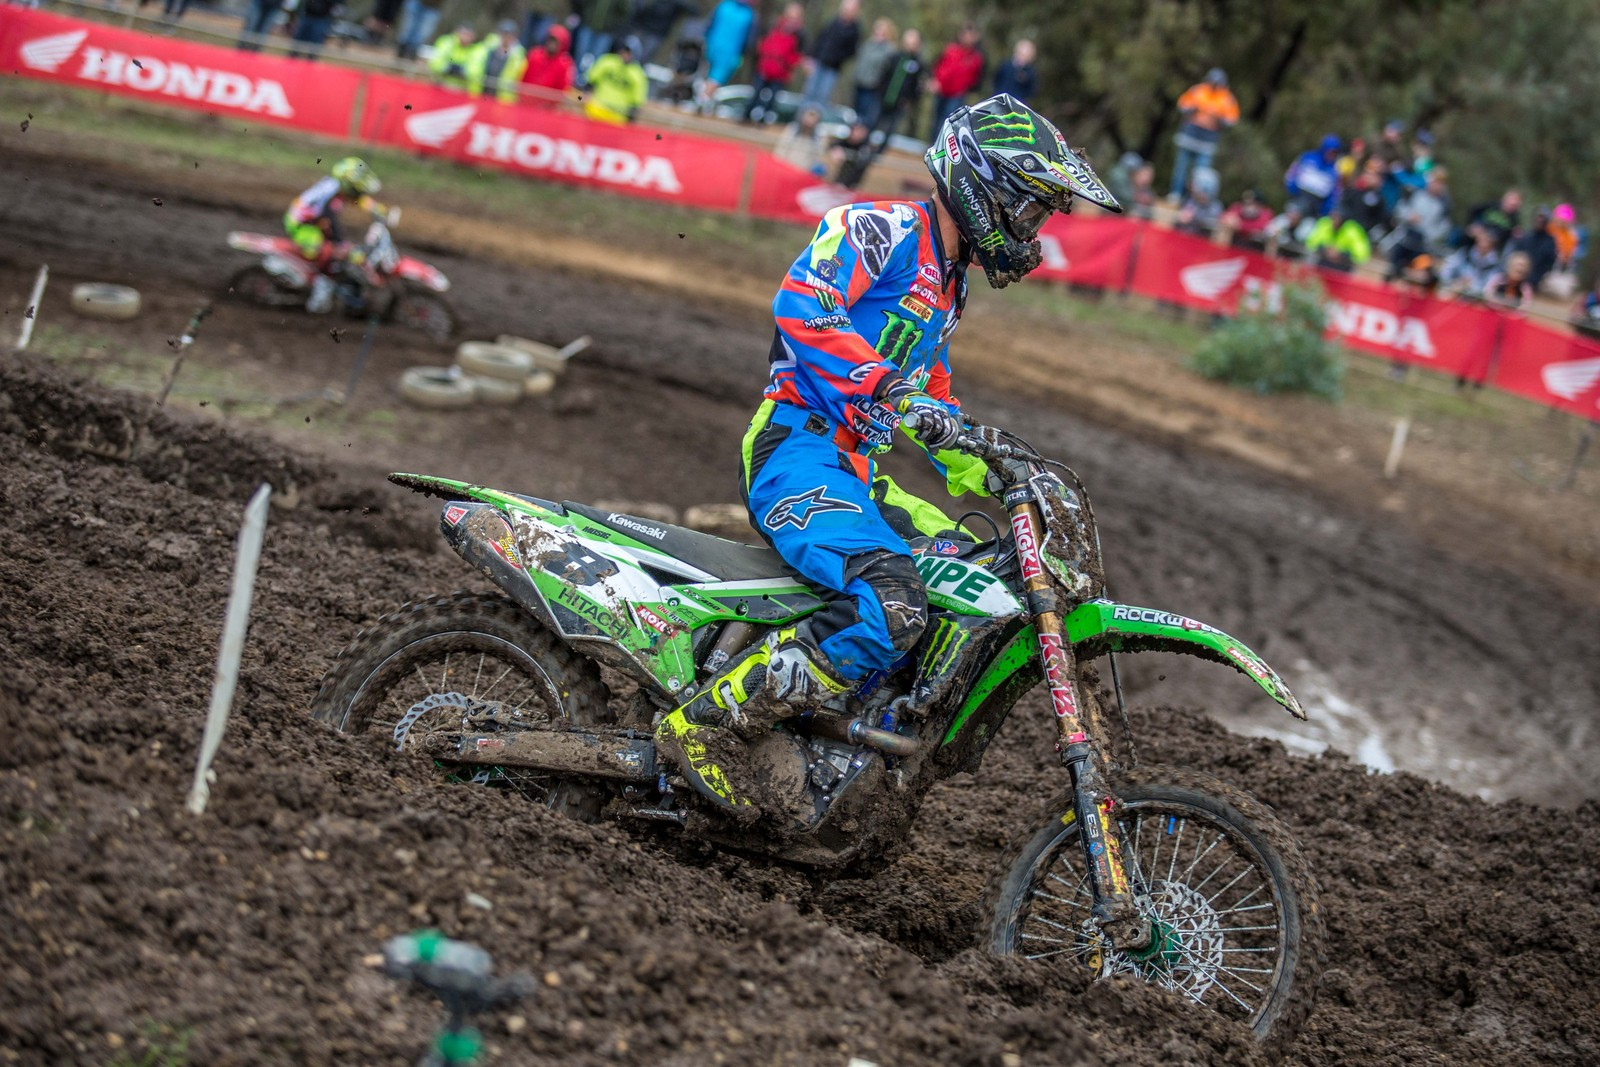 Kade Mosig - Australian Motul Motocross Nationals Round 3, Broadford - Motocross Pictures - Vital MX